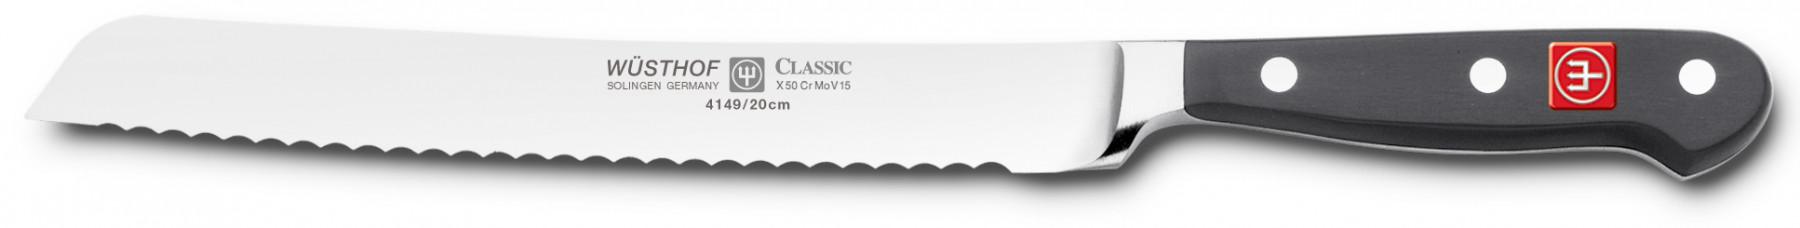 Wüsthof Dreizack Messergarnitur Classic 6tlg. Brotmesser